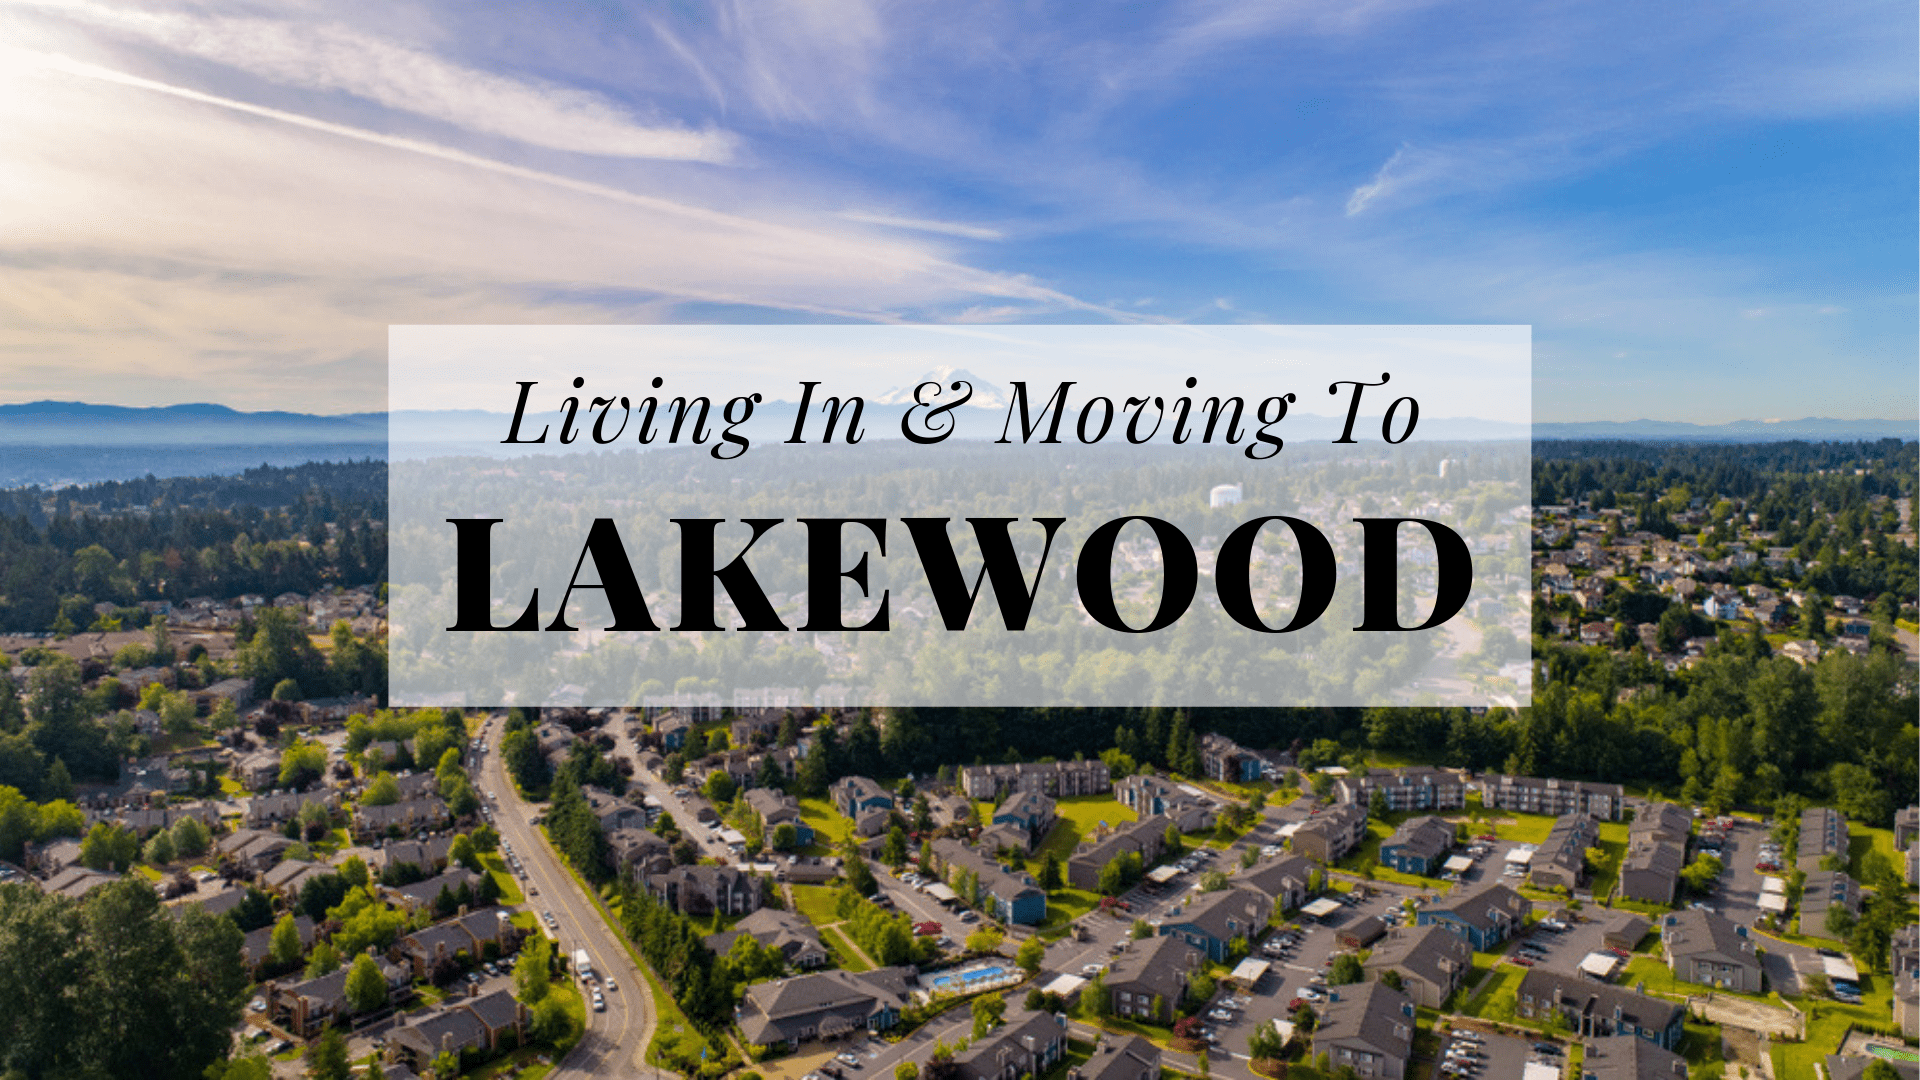 Living In & Moving To Lakewood, WA